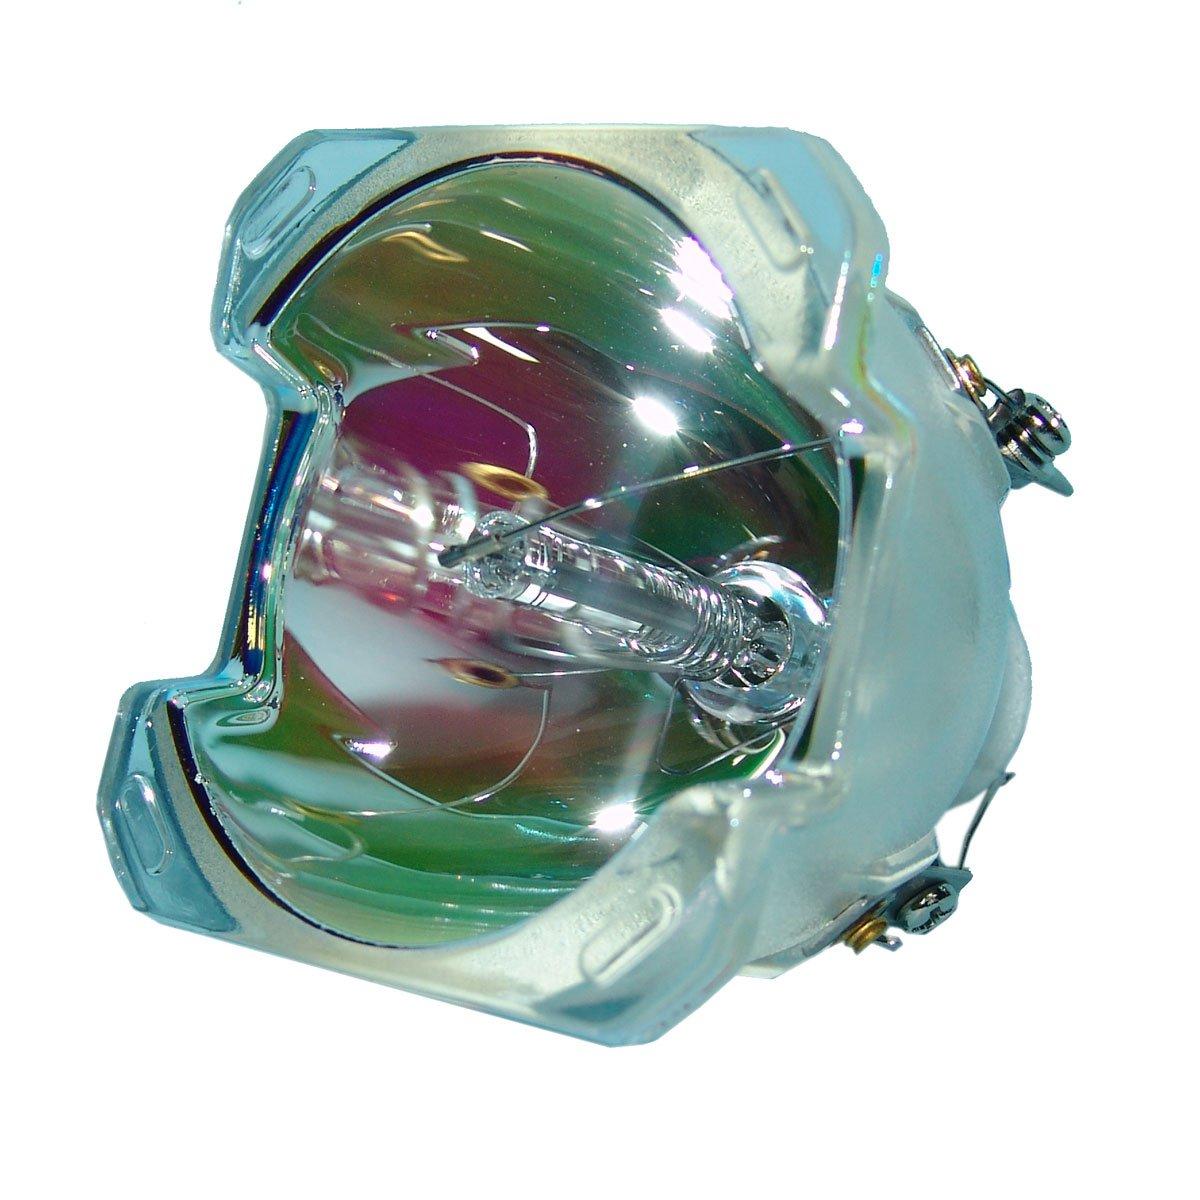 Lutema OEM プロジェクター交換用ランプ ハウジング/電球付き ProjectionDesign Action用 M5 Economy Economy Lamp Only B07KTJWL35